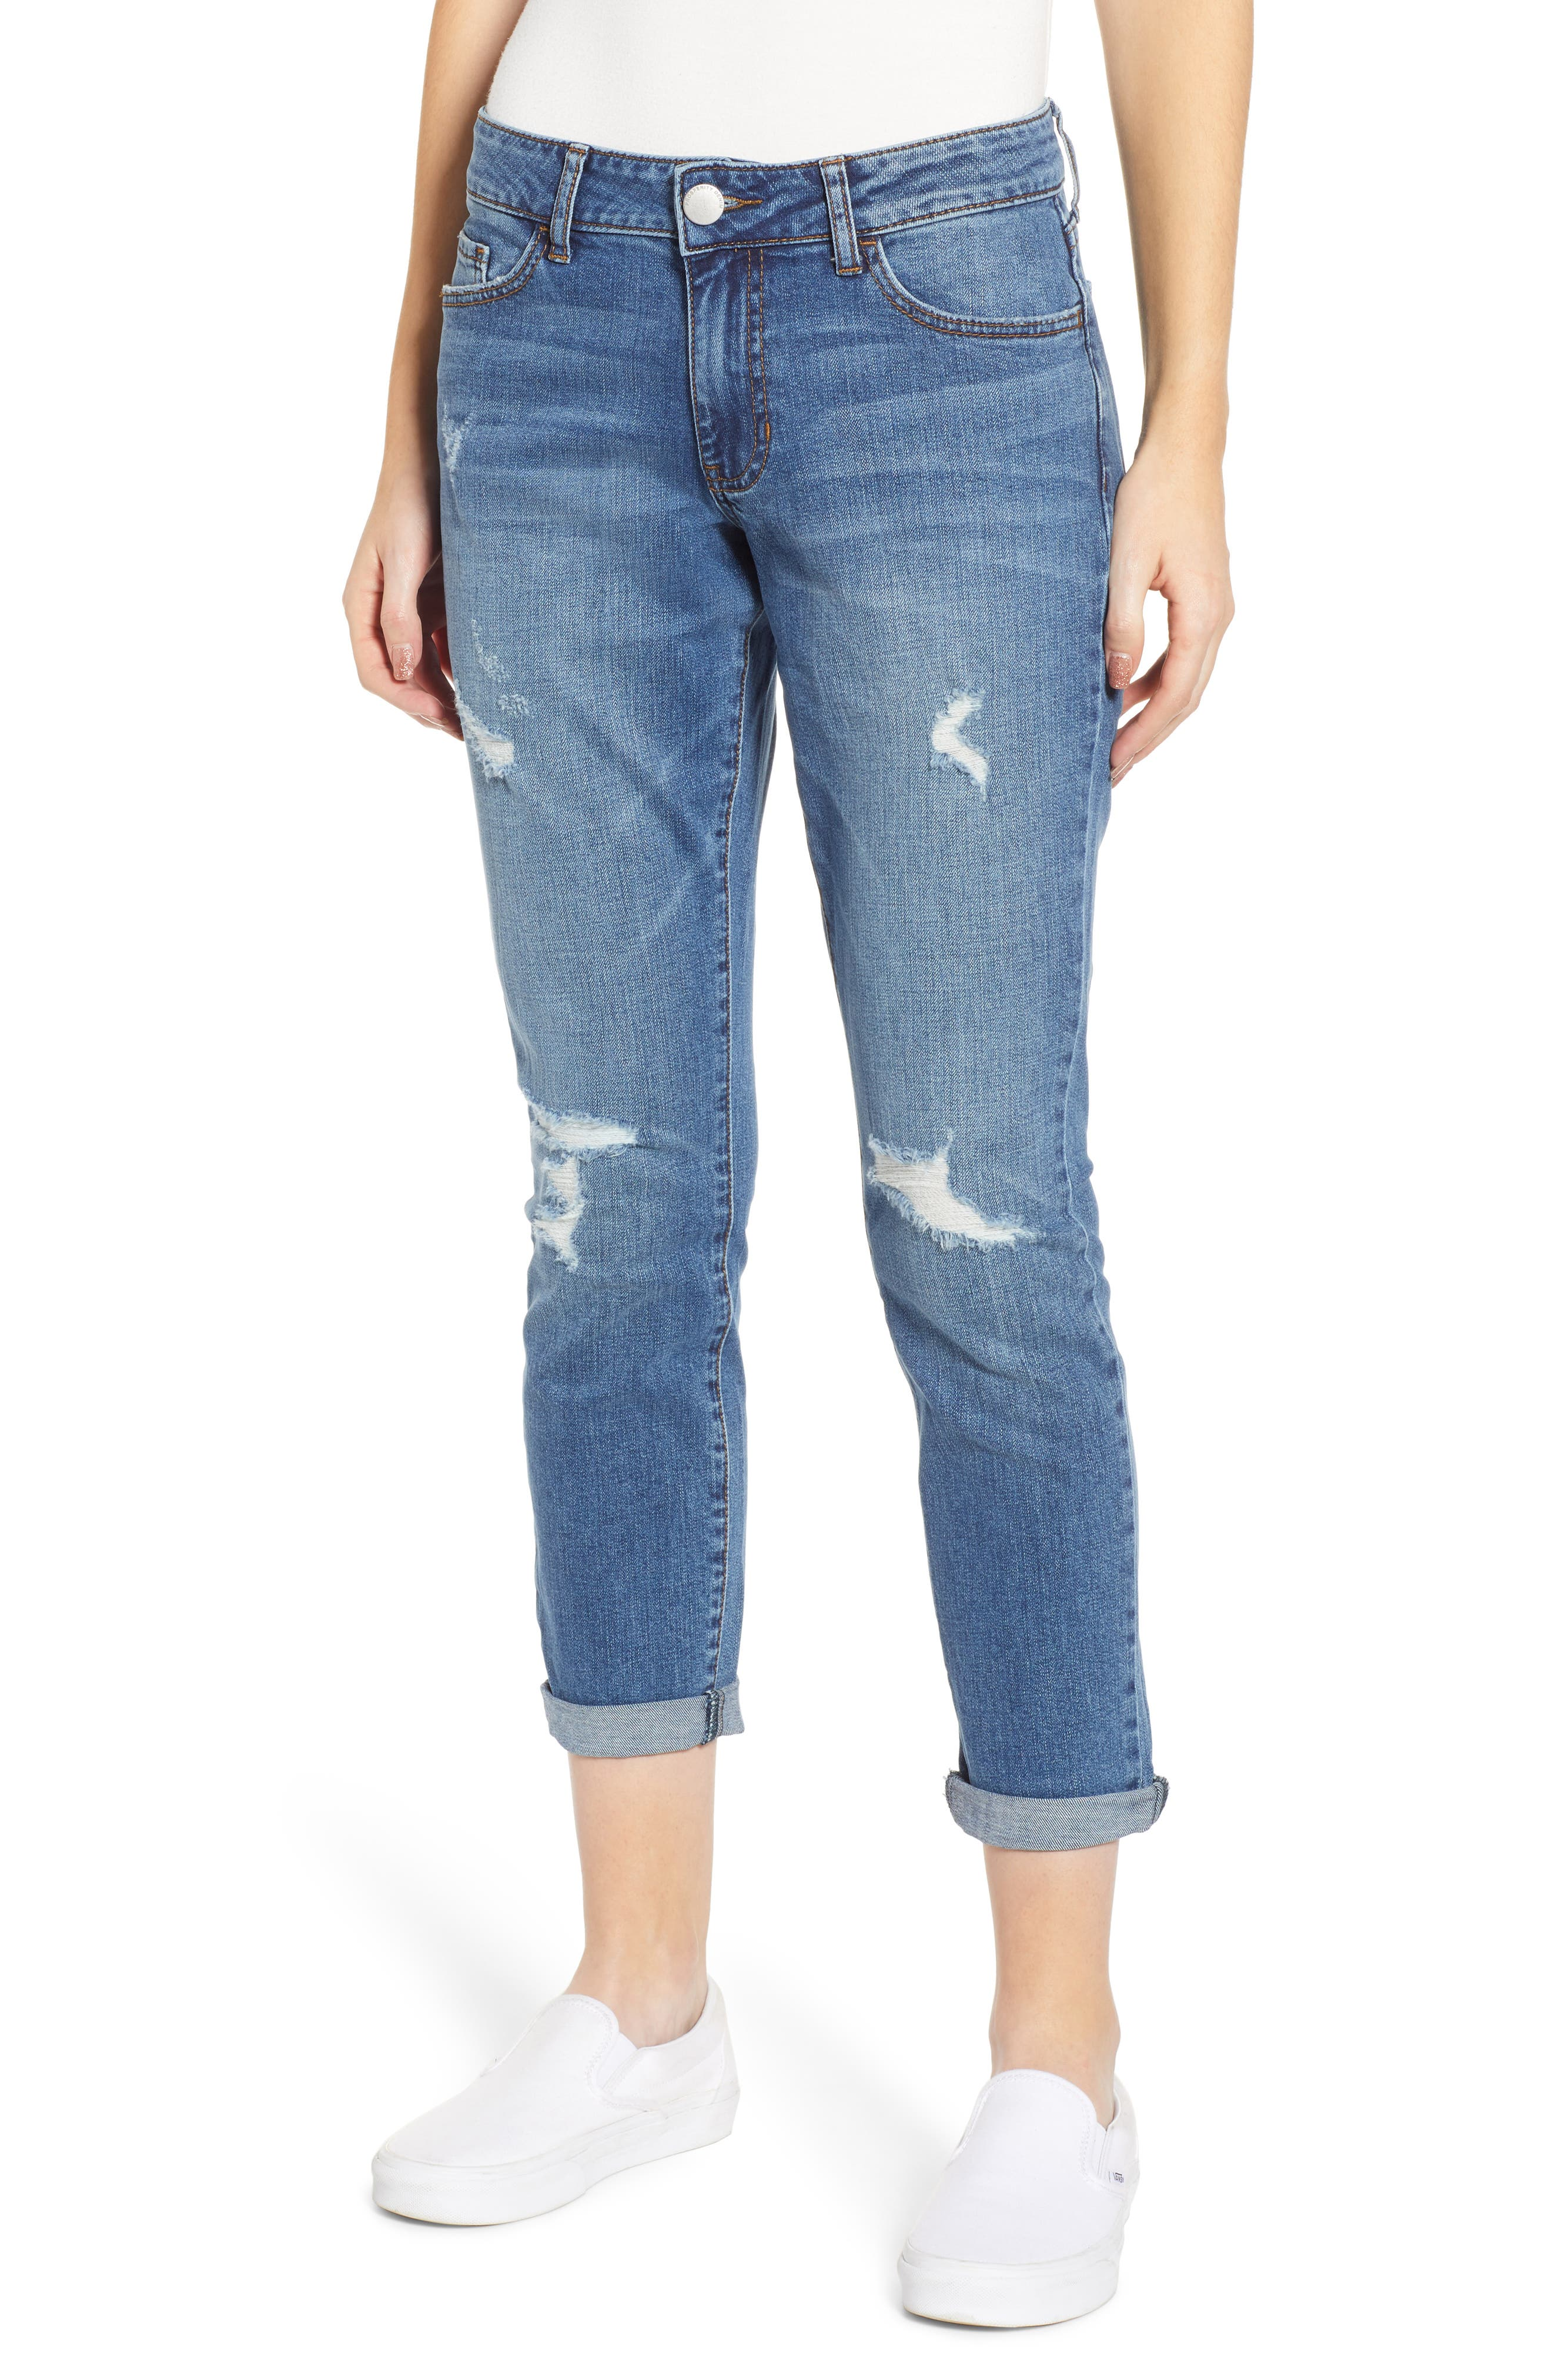 PROSPERITY DENIM, Distressed Ankle Boyfriend Jeans, Main thumbnail 1, color, MEDIUM WASH